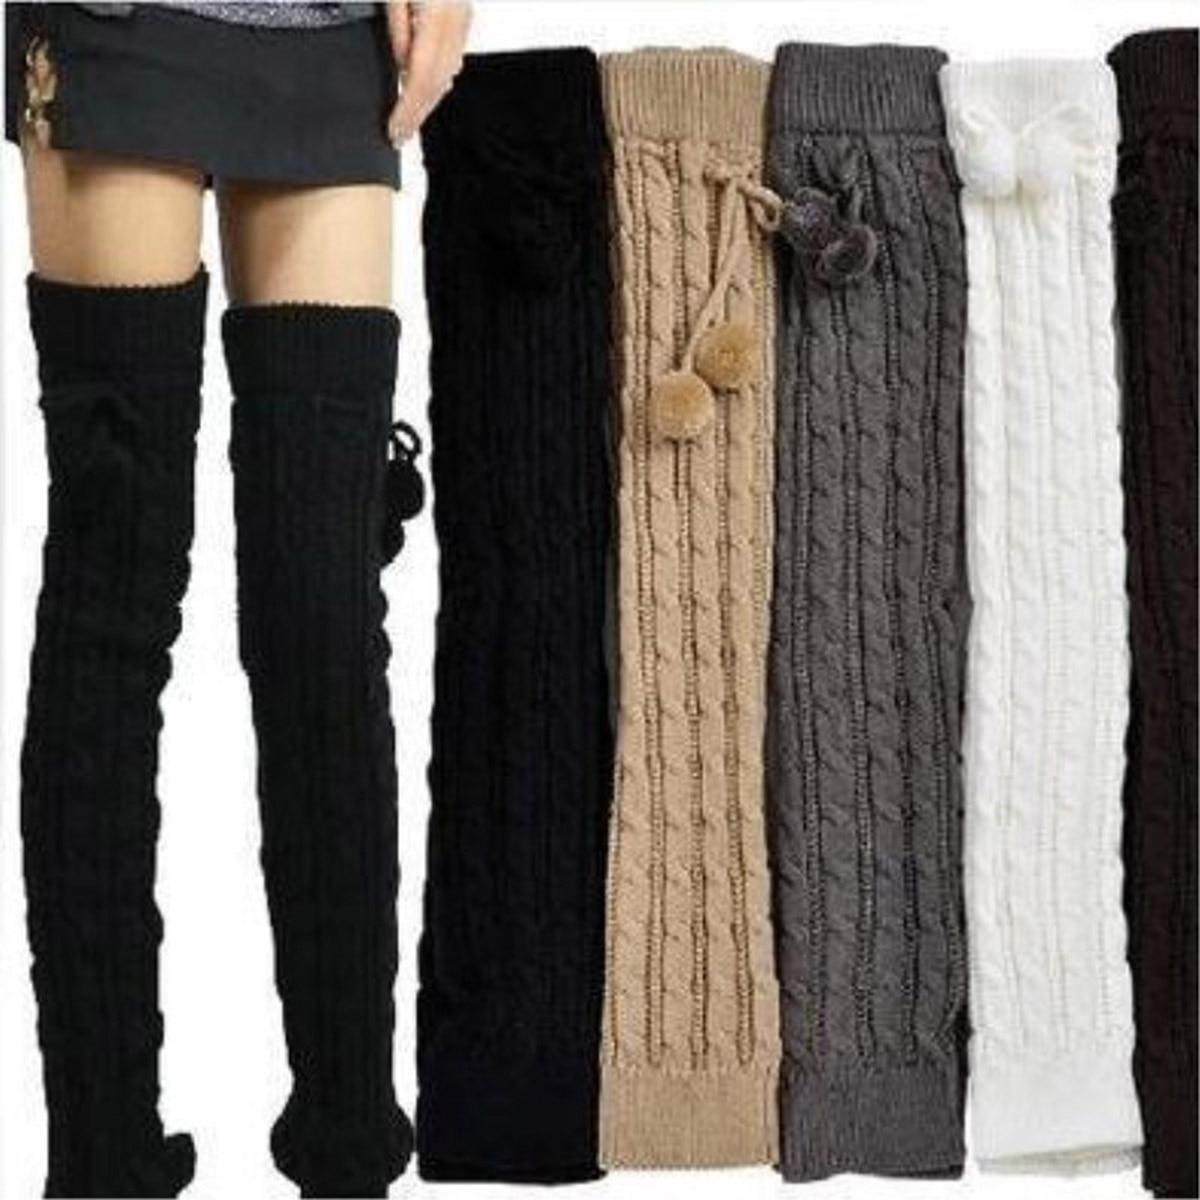 Носки 2 пары, гетры, чулки, гетры, колготки, до колена, спортивные носки, носки, сапоги, длинные носки, длинные чулки